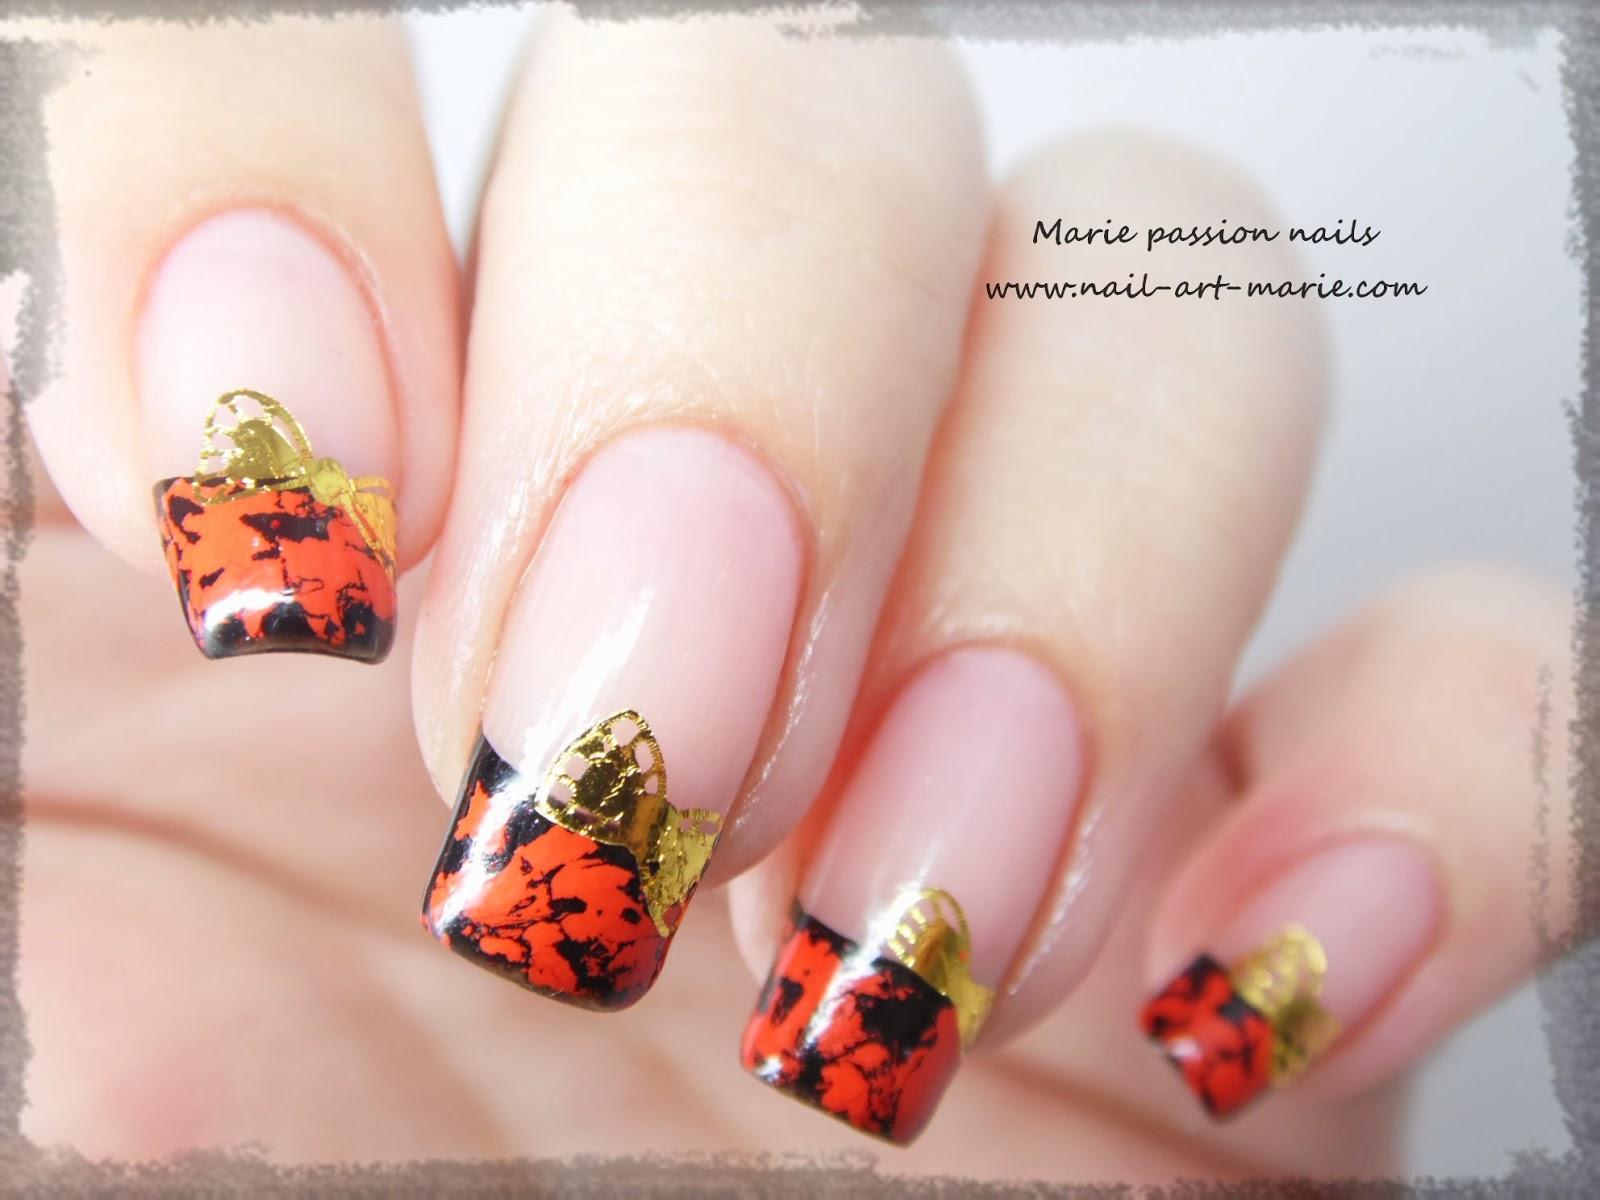 Nail Art avec craquelures de foils matte3